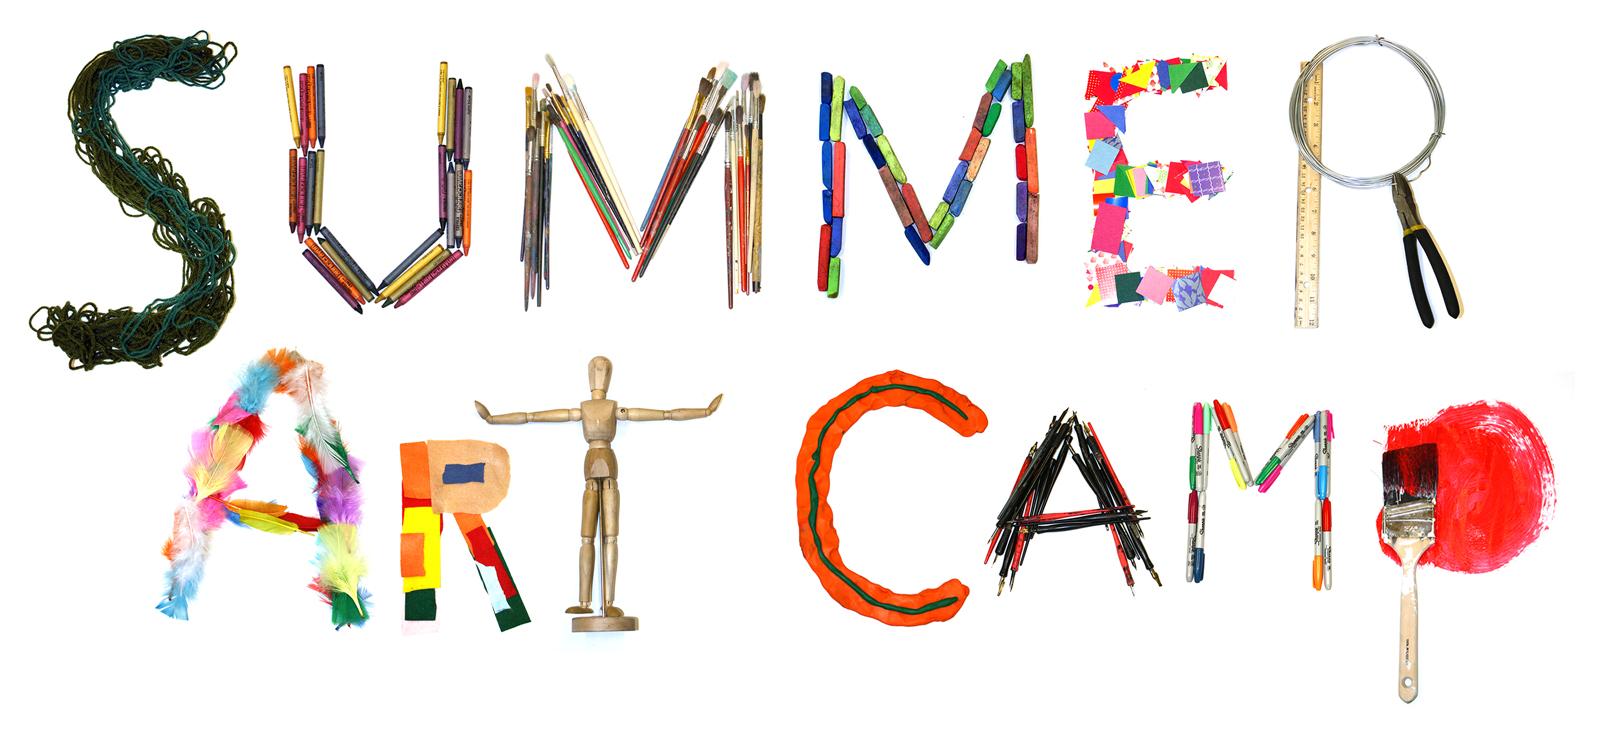 1620x736 Art Camp 2013